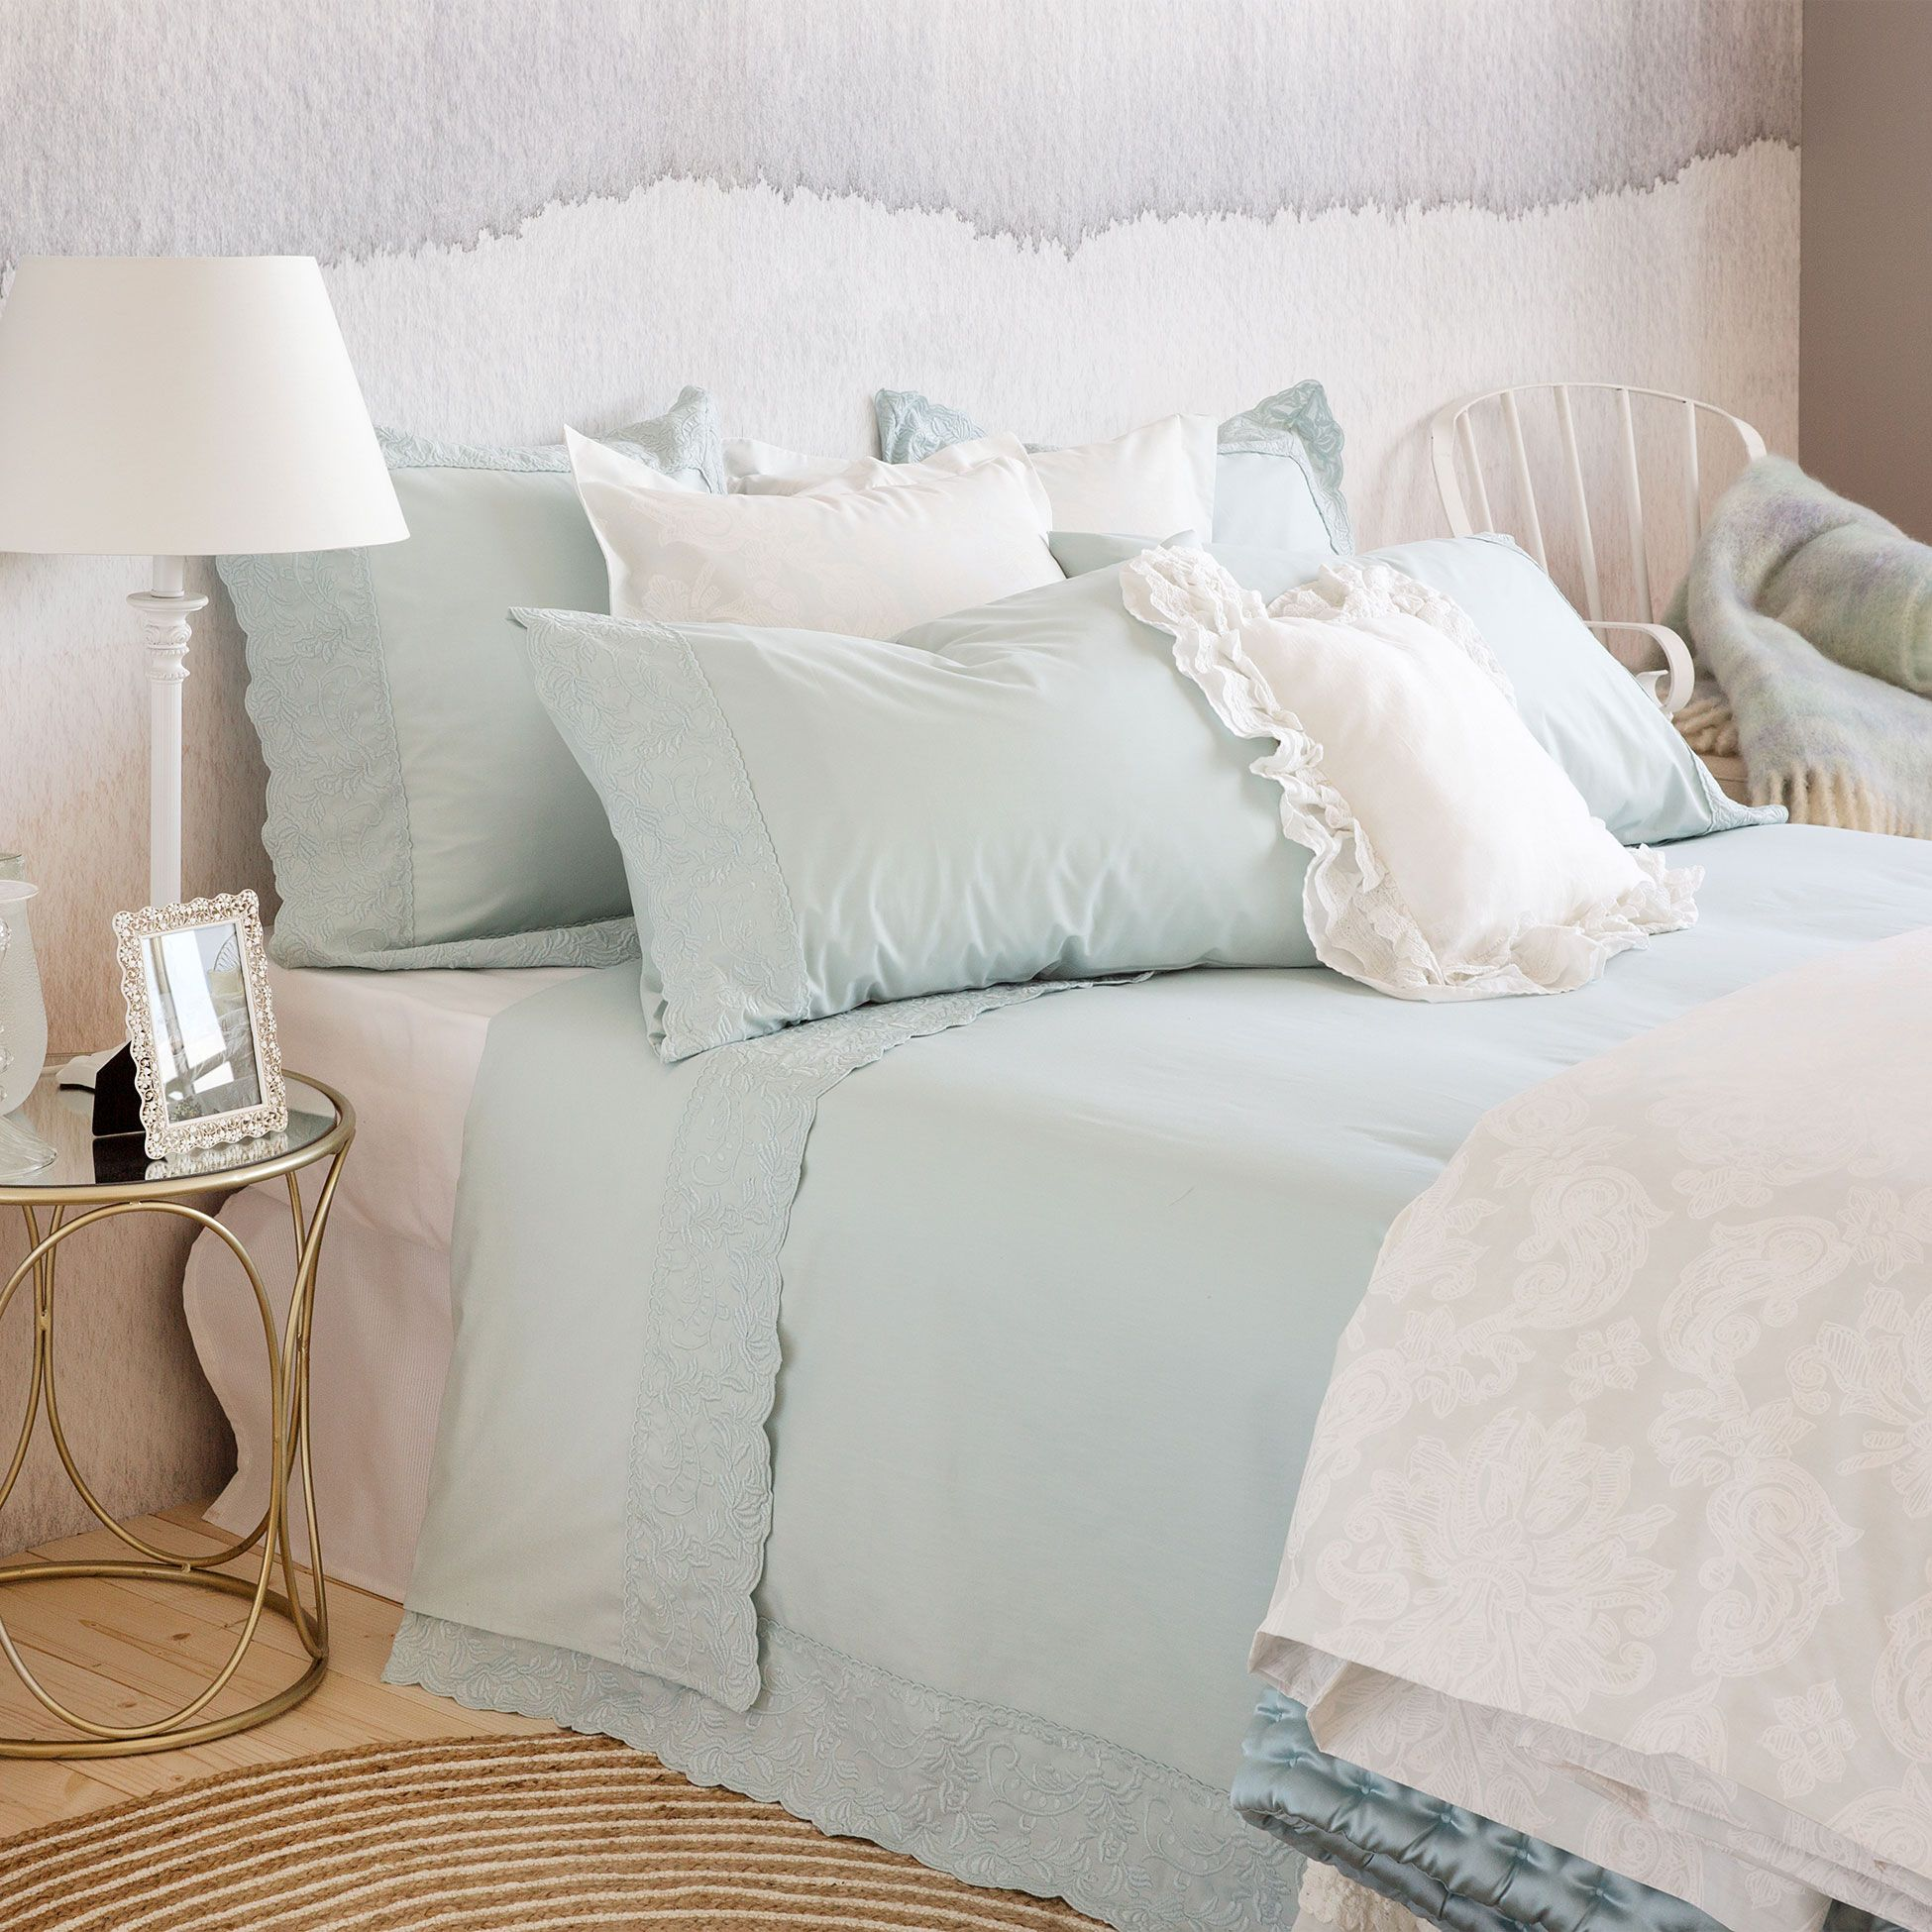 Zara Home, Bed Linen Australia